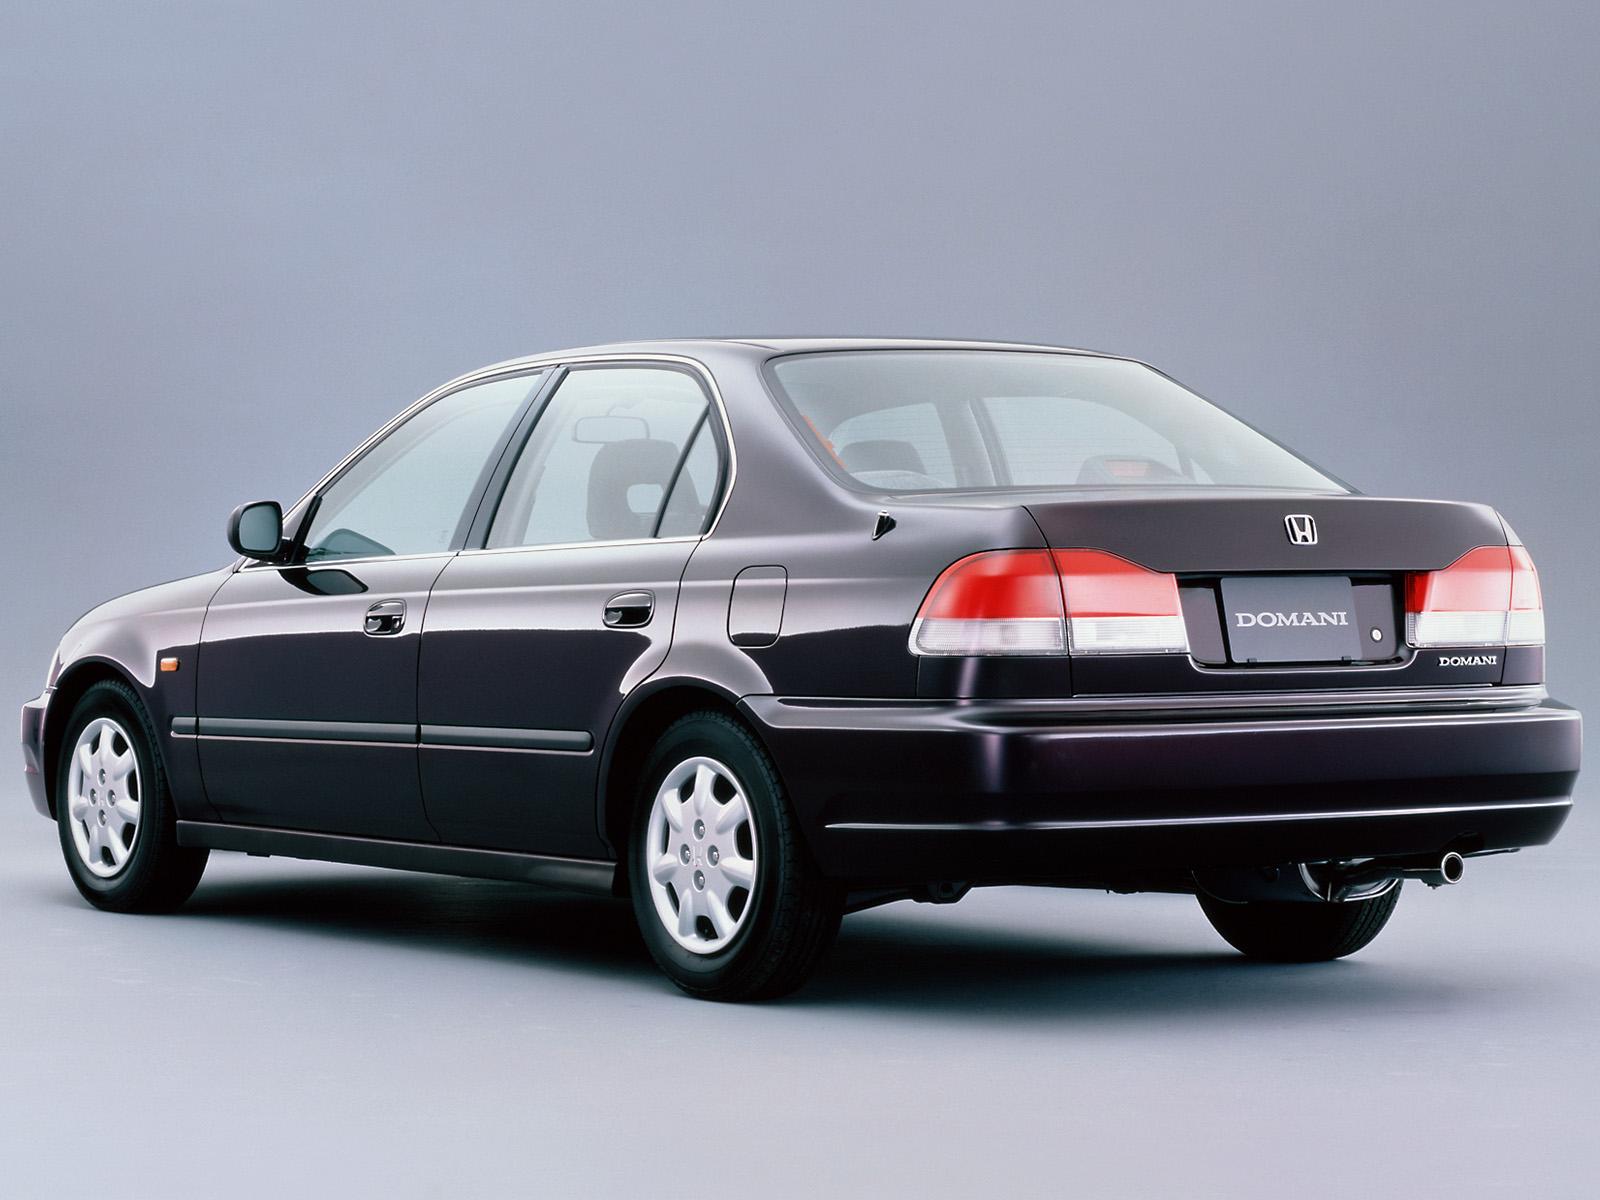 Honda Domani Photos Photogallery With 8 Pics Carsbase Com